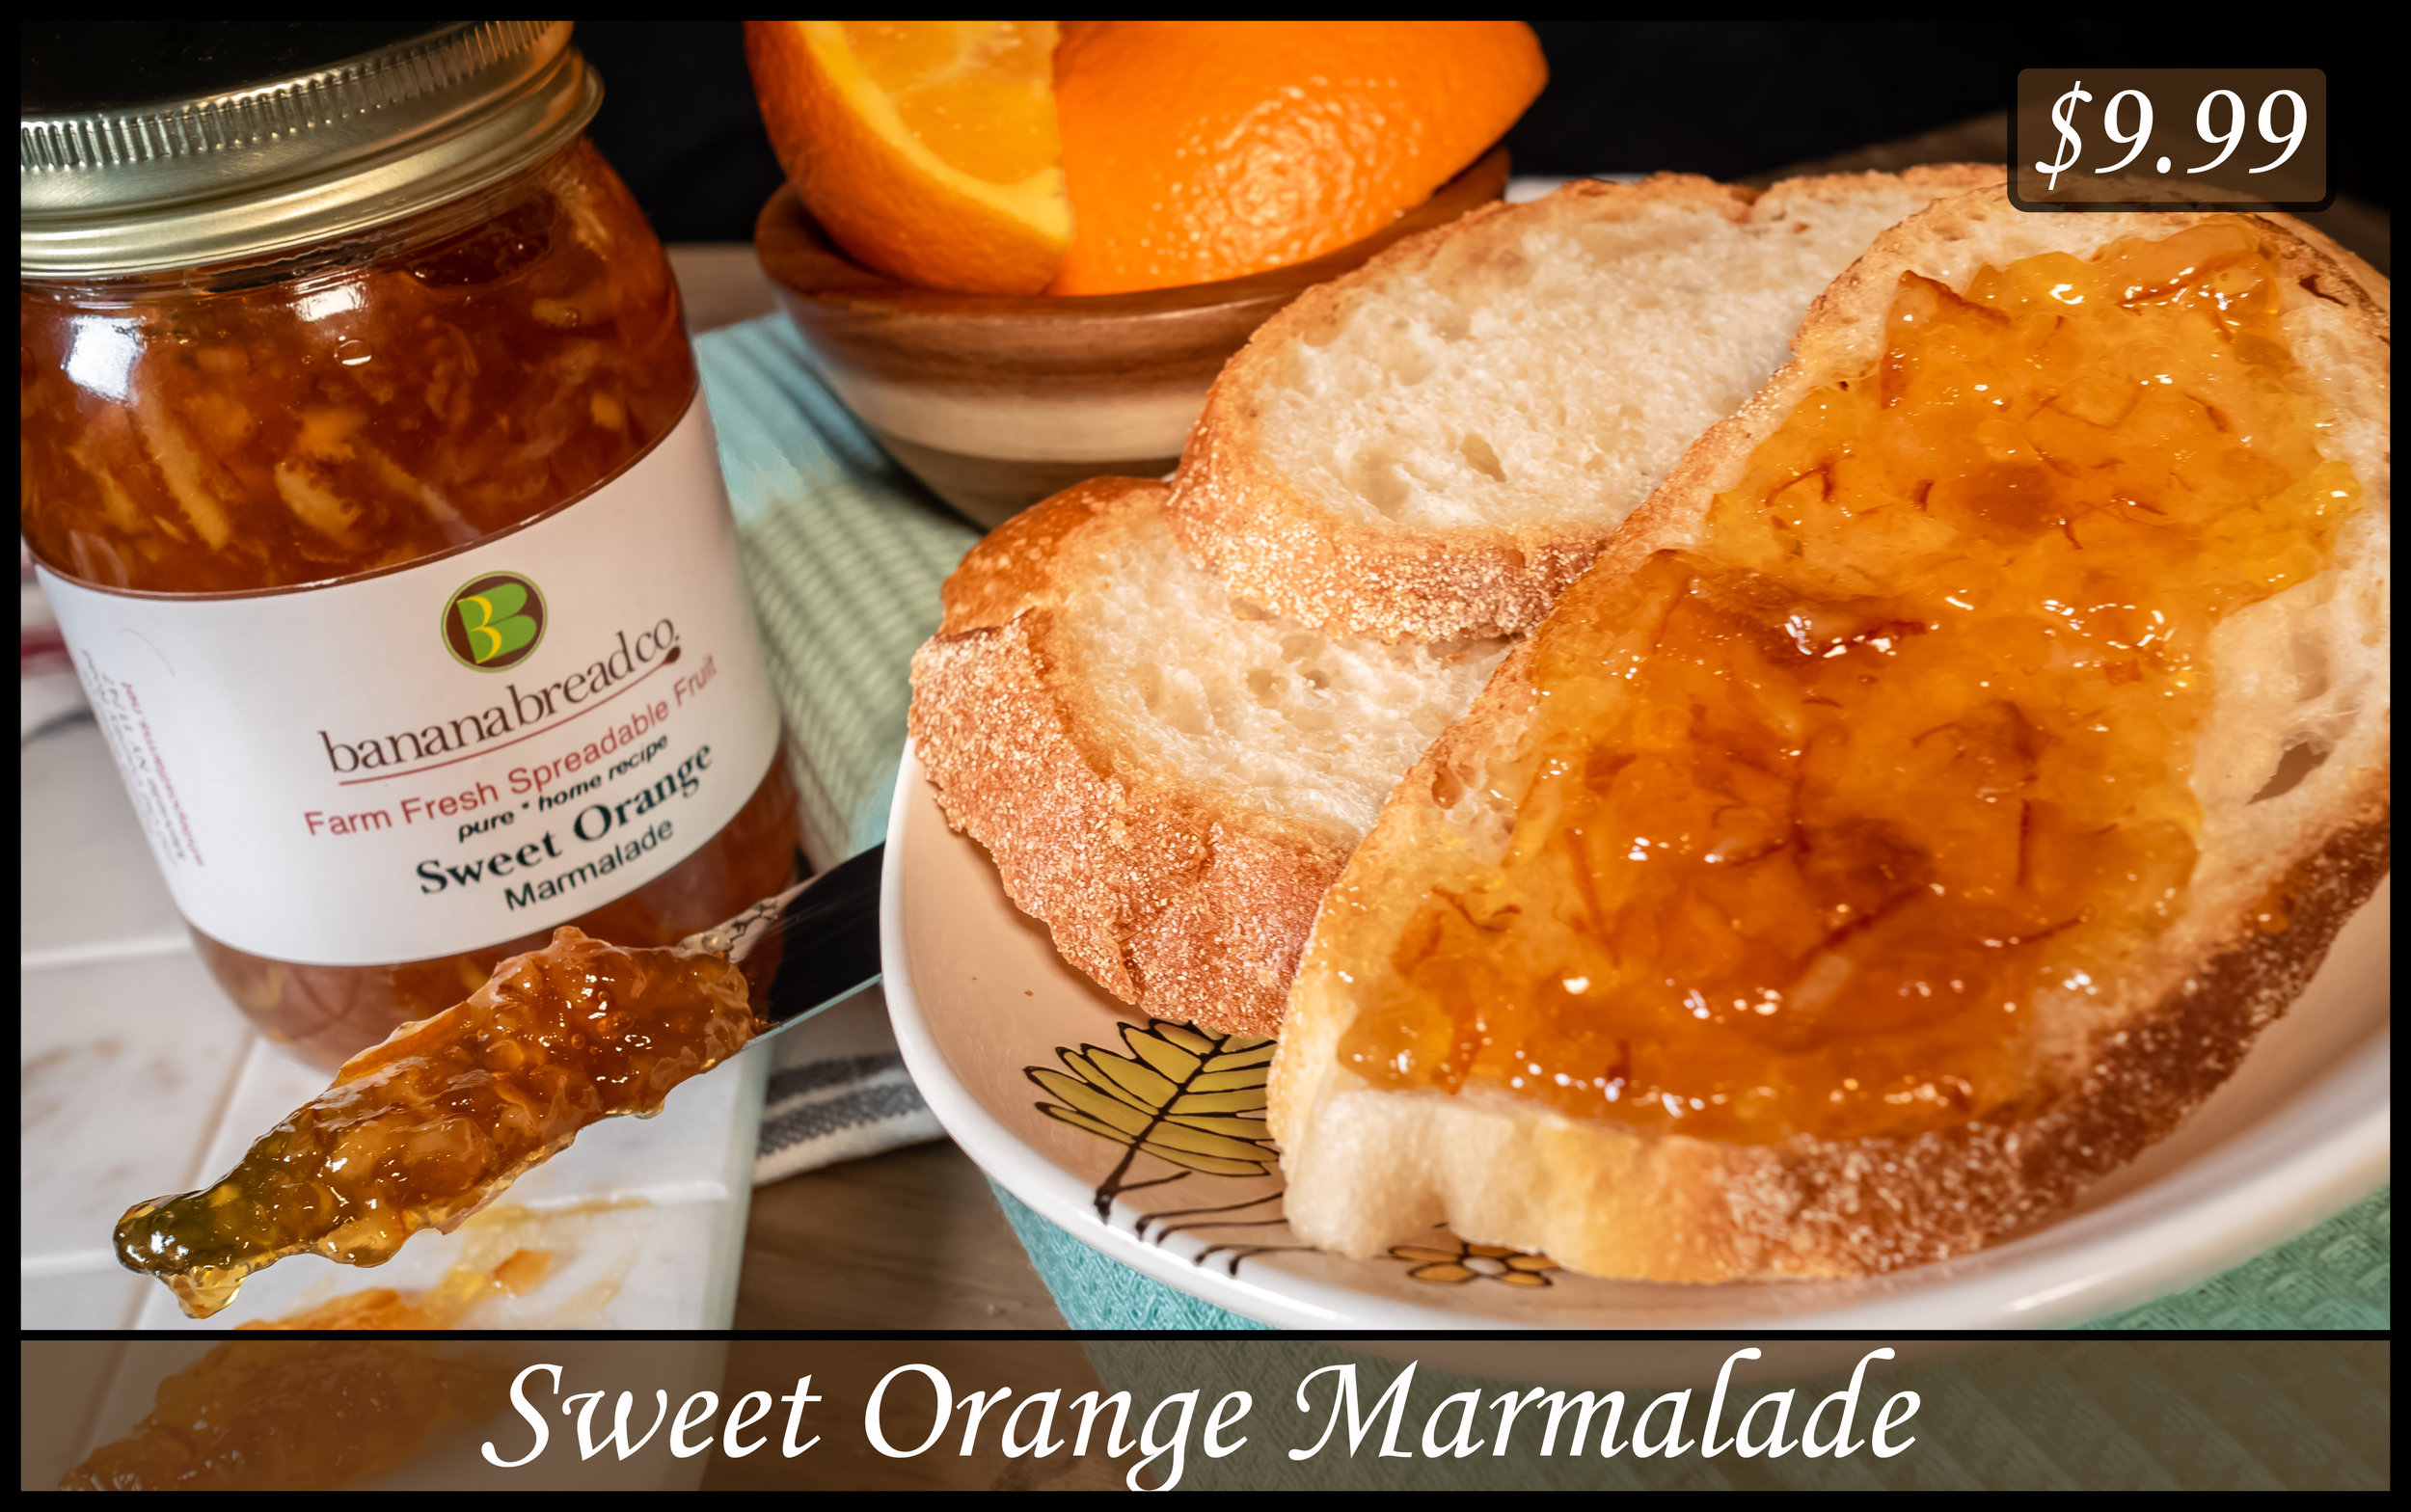 Sweet Orange Marmalade.jpg